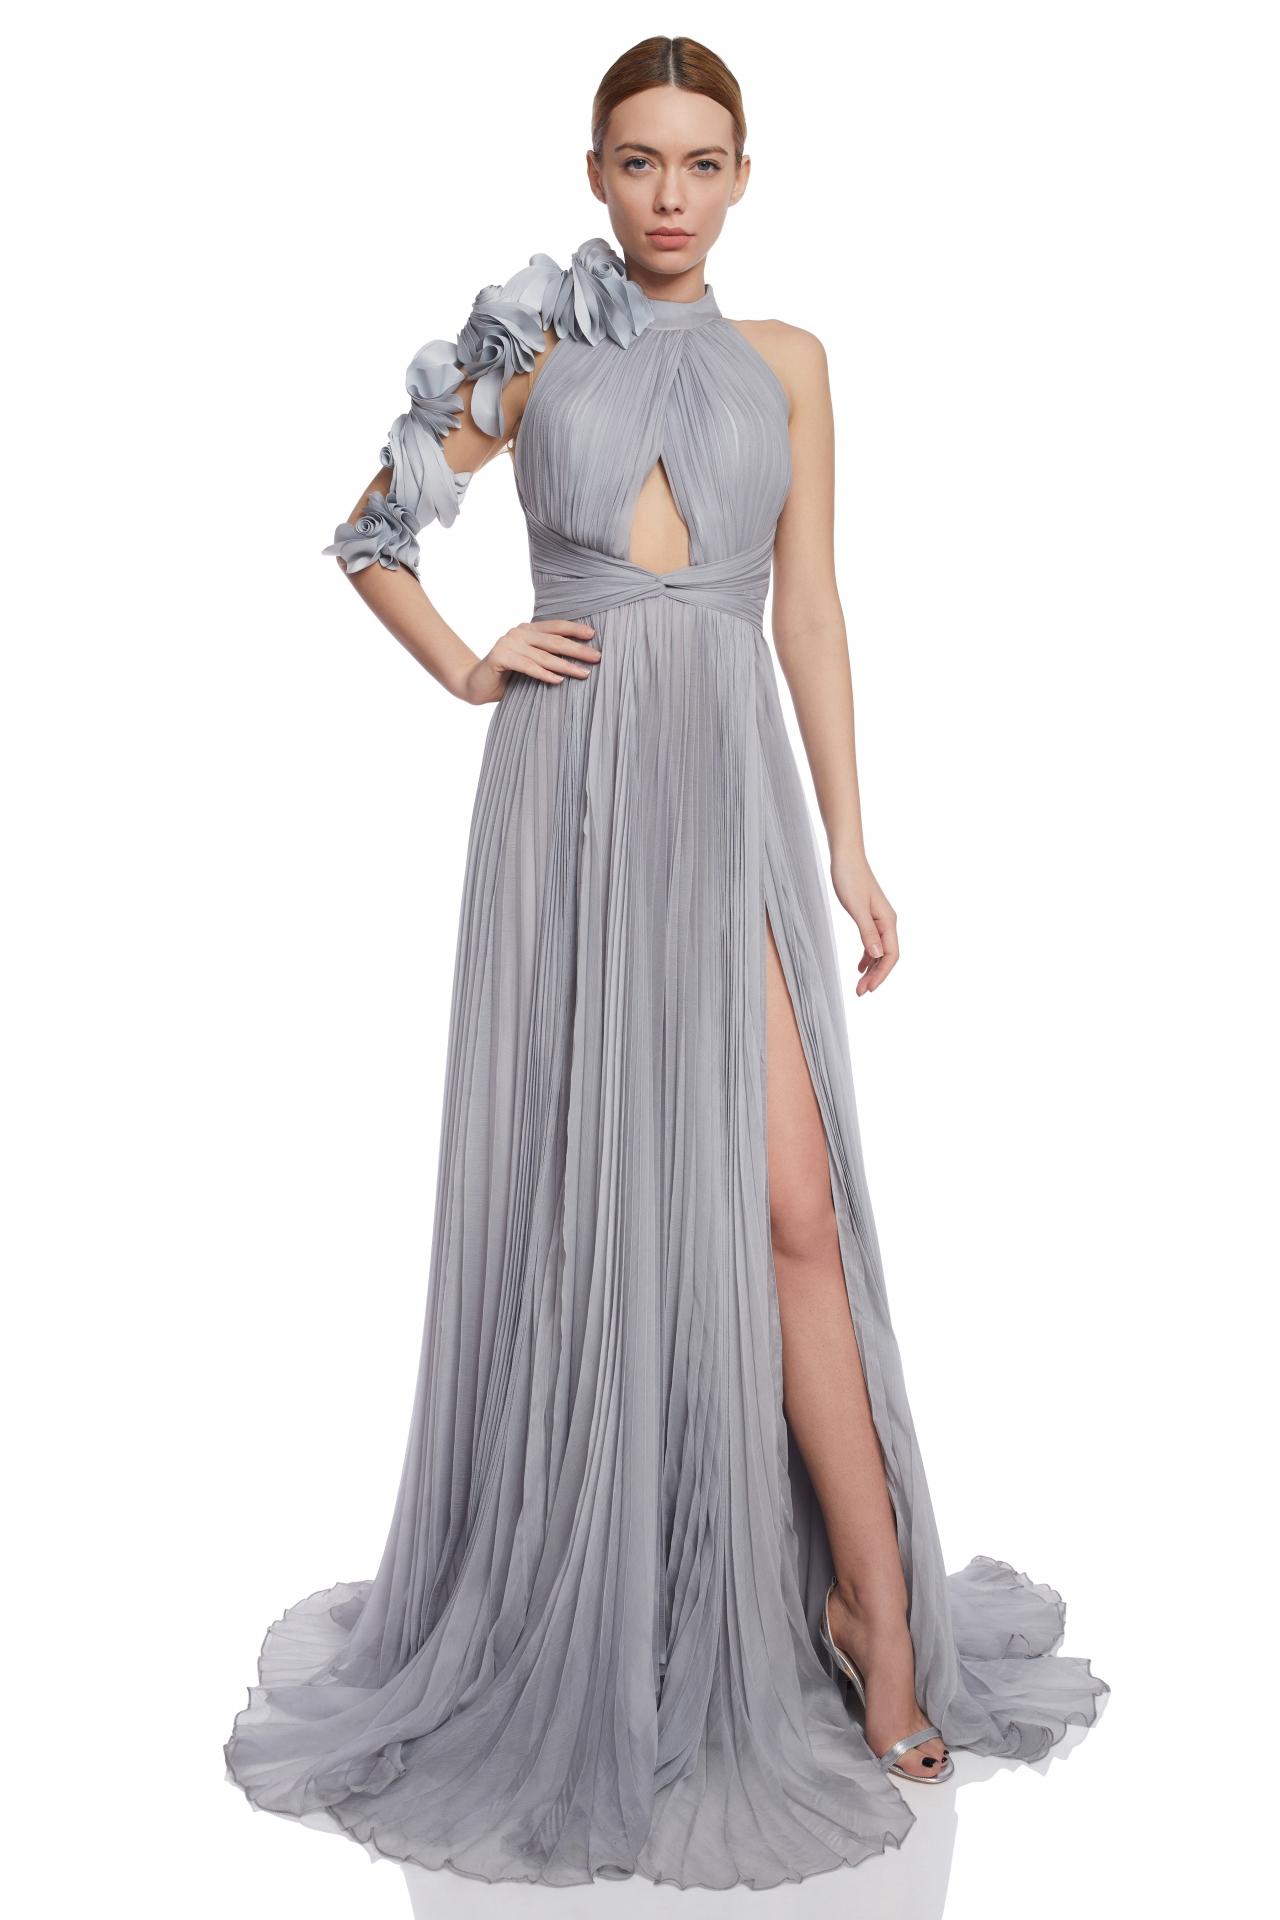 Ruffled flowers silk dress